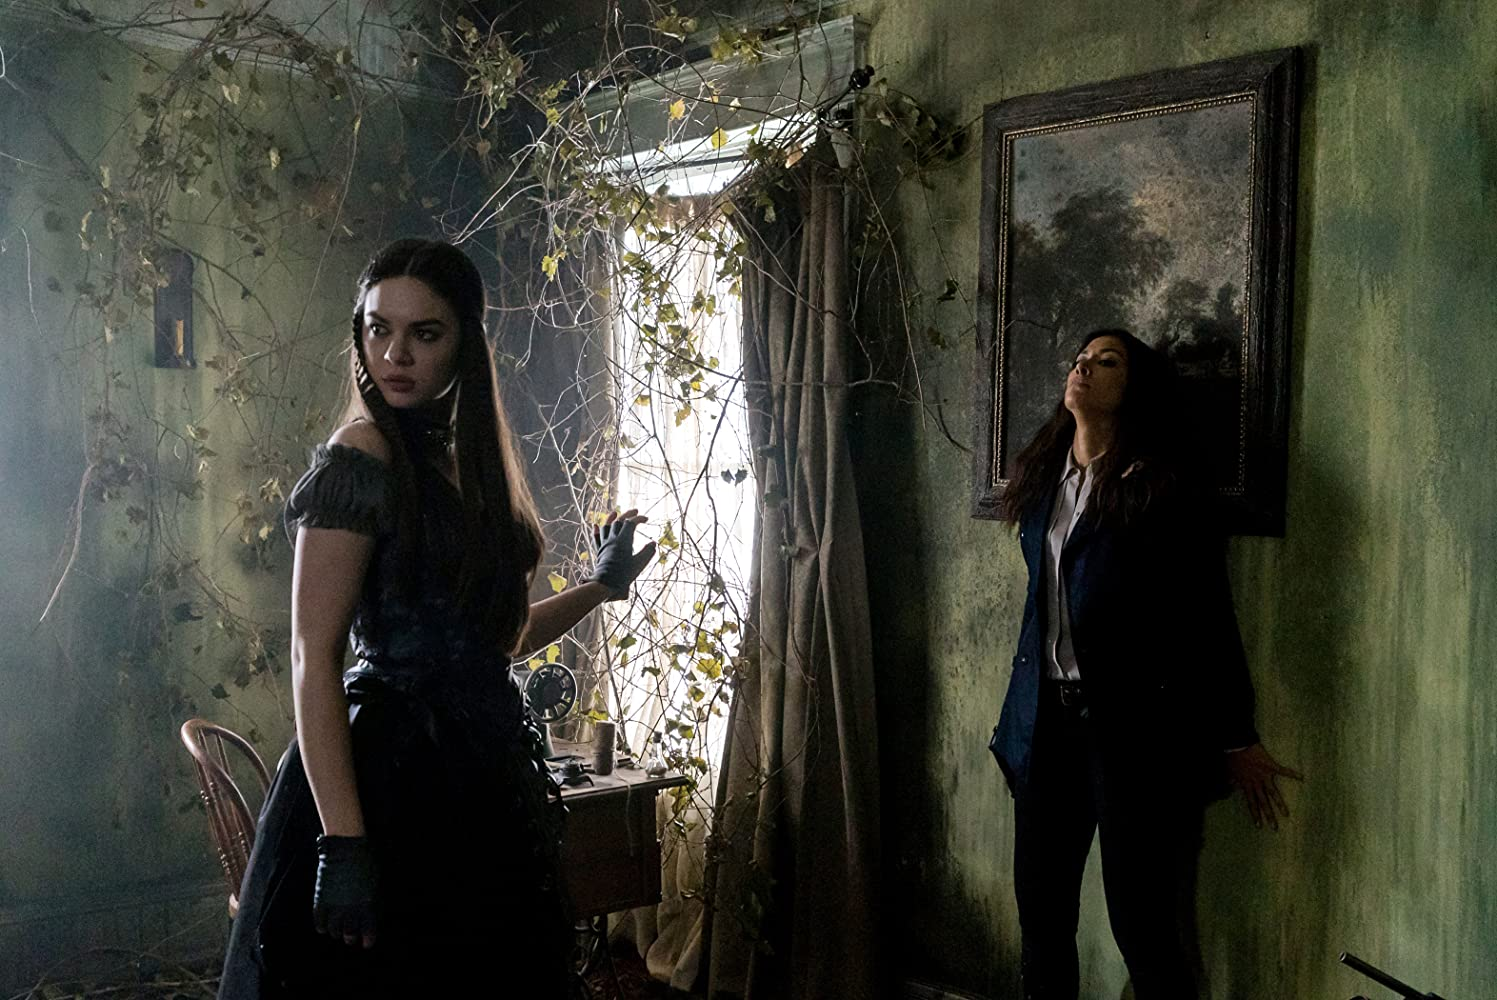 Janina Gavankar and Courtney Lakin in Sleepy Hollow (2013)